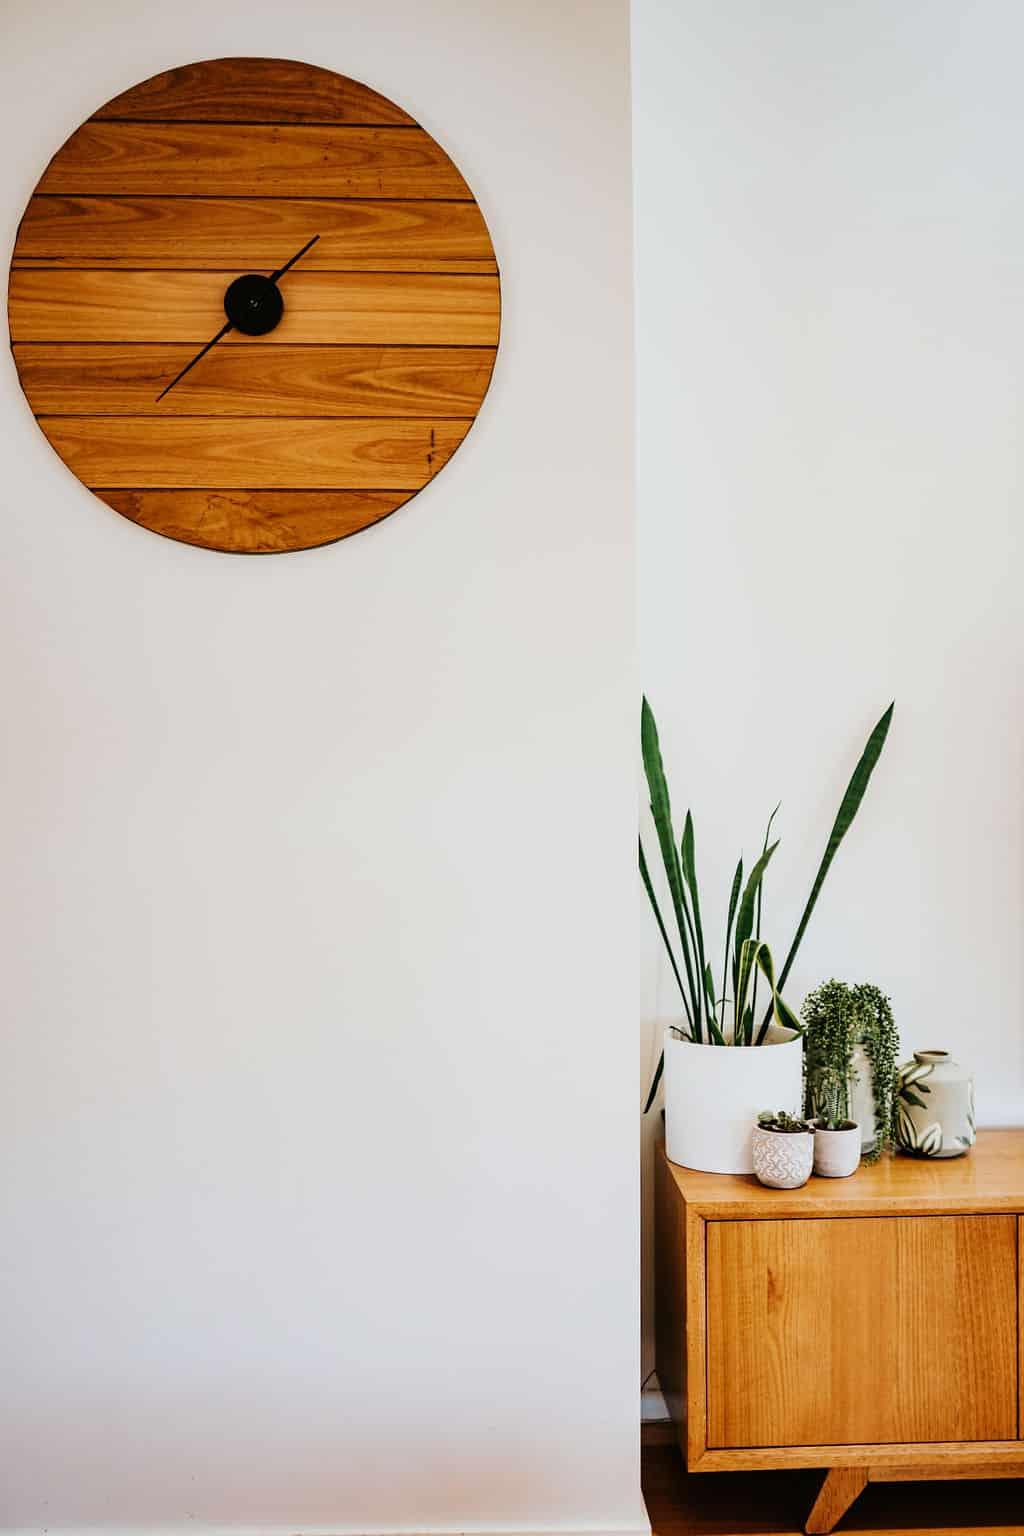 Locspec Building Oak Flats Renovation - wooden clock on a white wall.